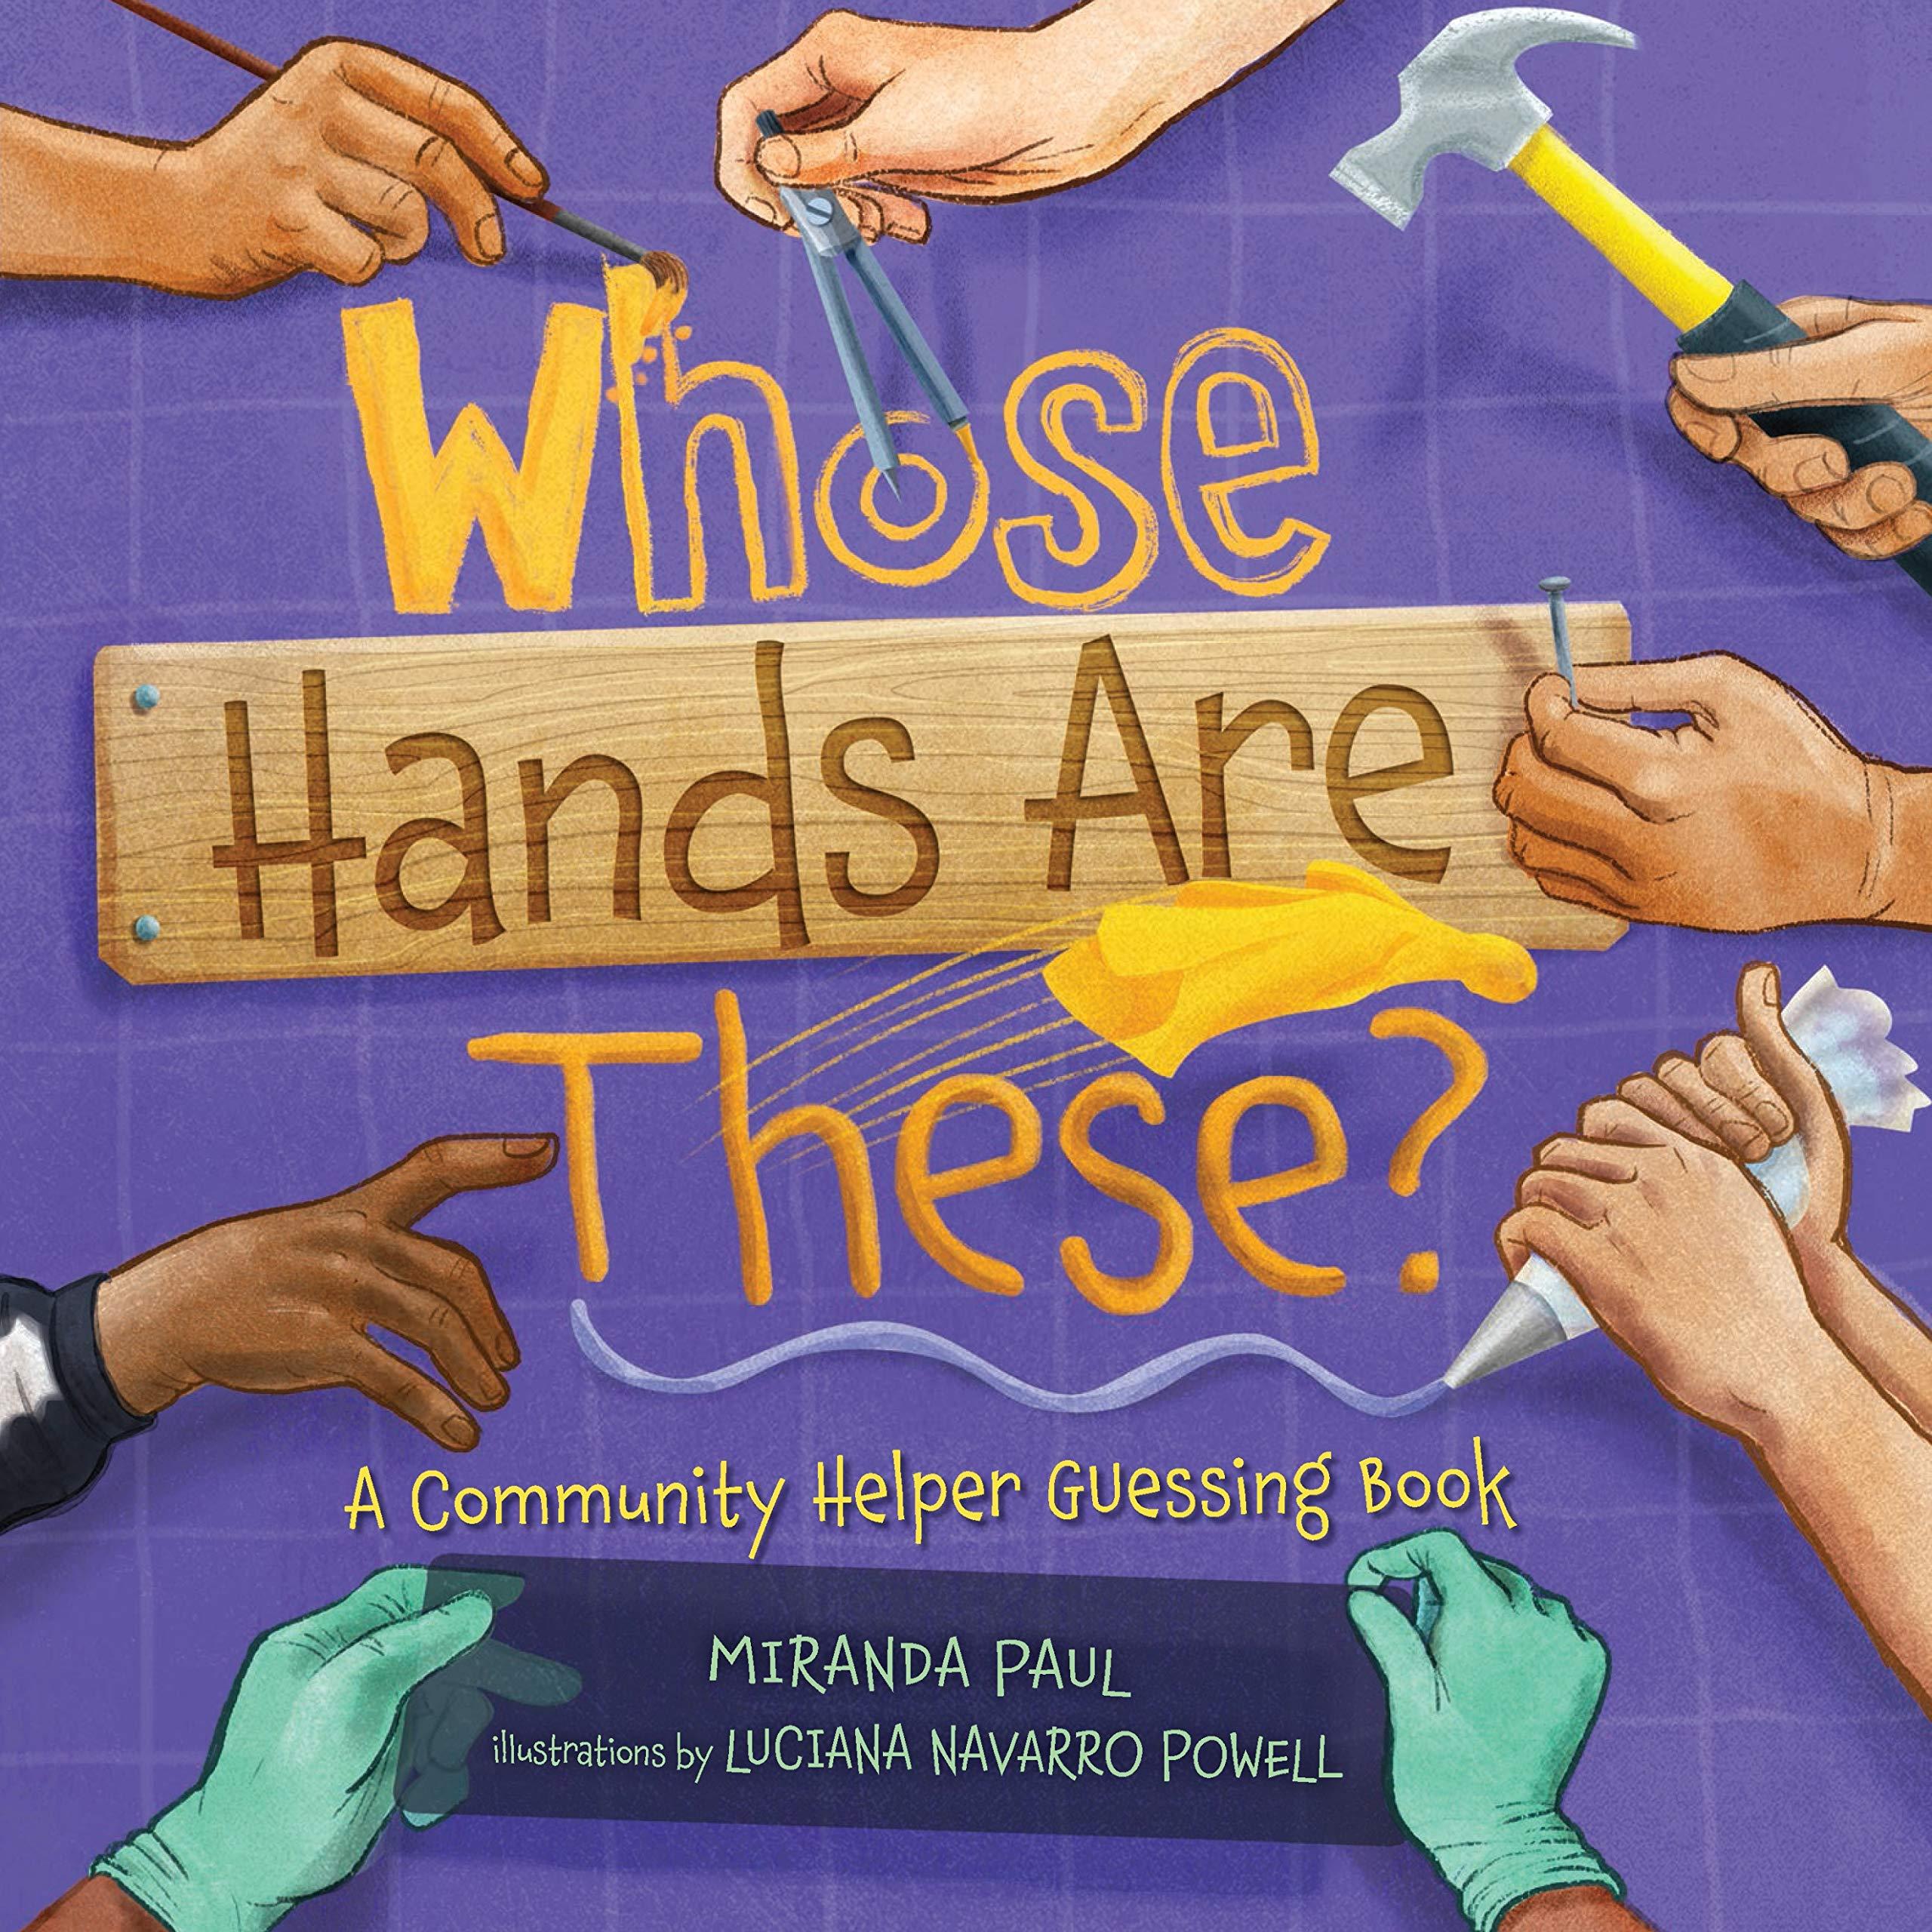 Whose Hands Are These?: A Community Helper Guessing Book: Paul, Miranda,  Powell, Luciana Navarro: 9781467752145: Amazon.com: Books